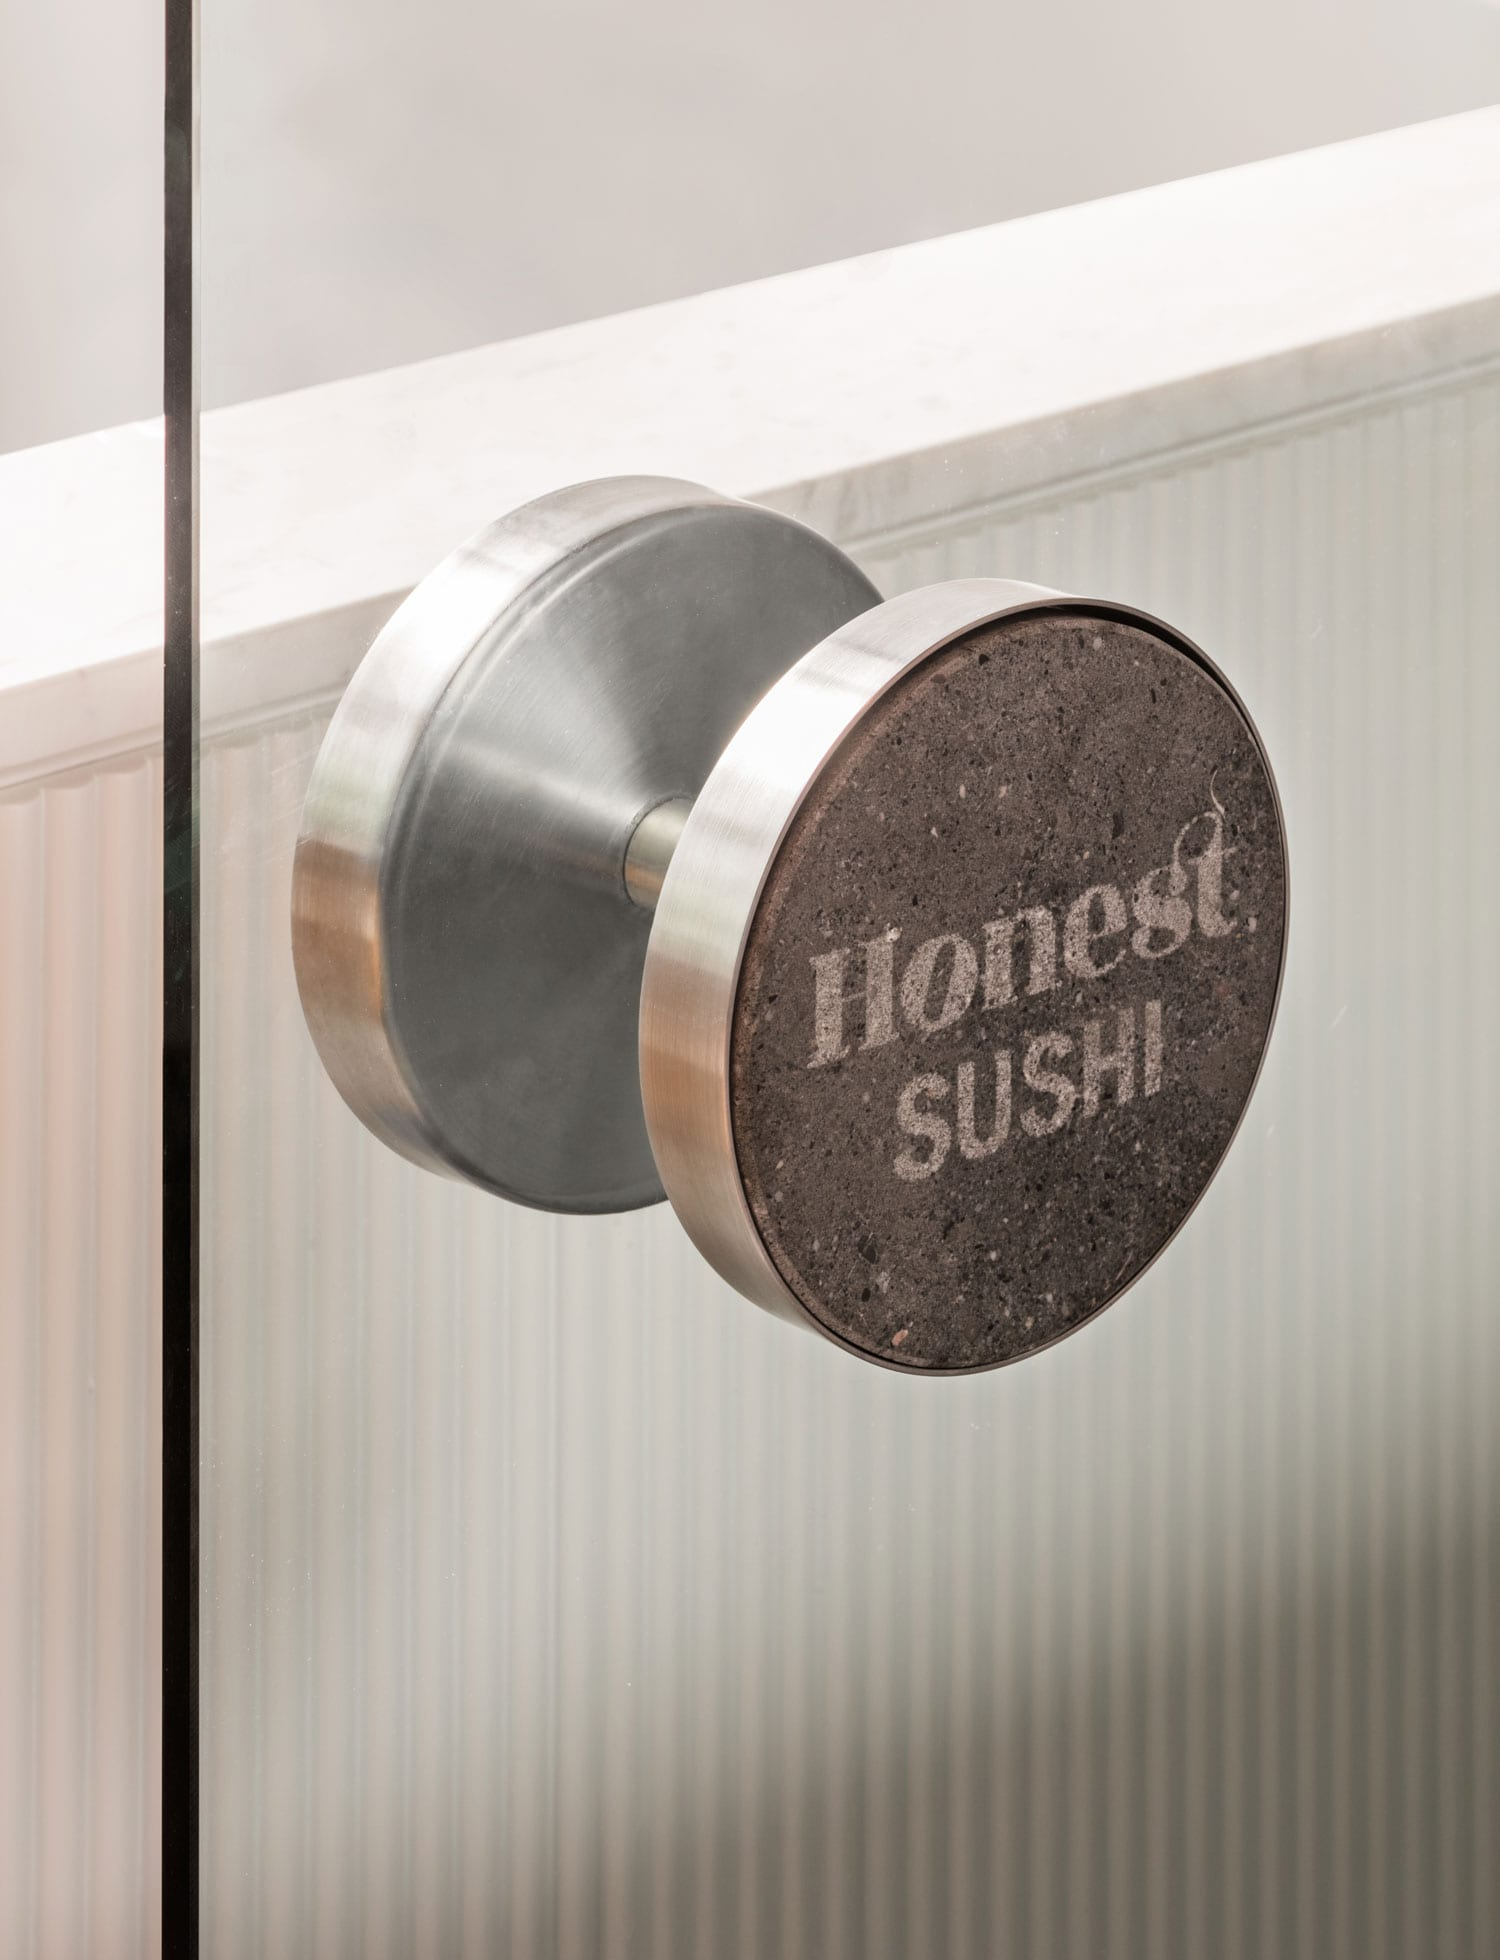 Honest Sushi by Studio LABOTORY   Yellowtrace